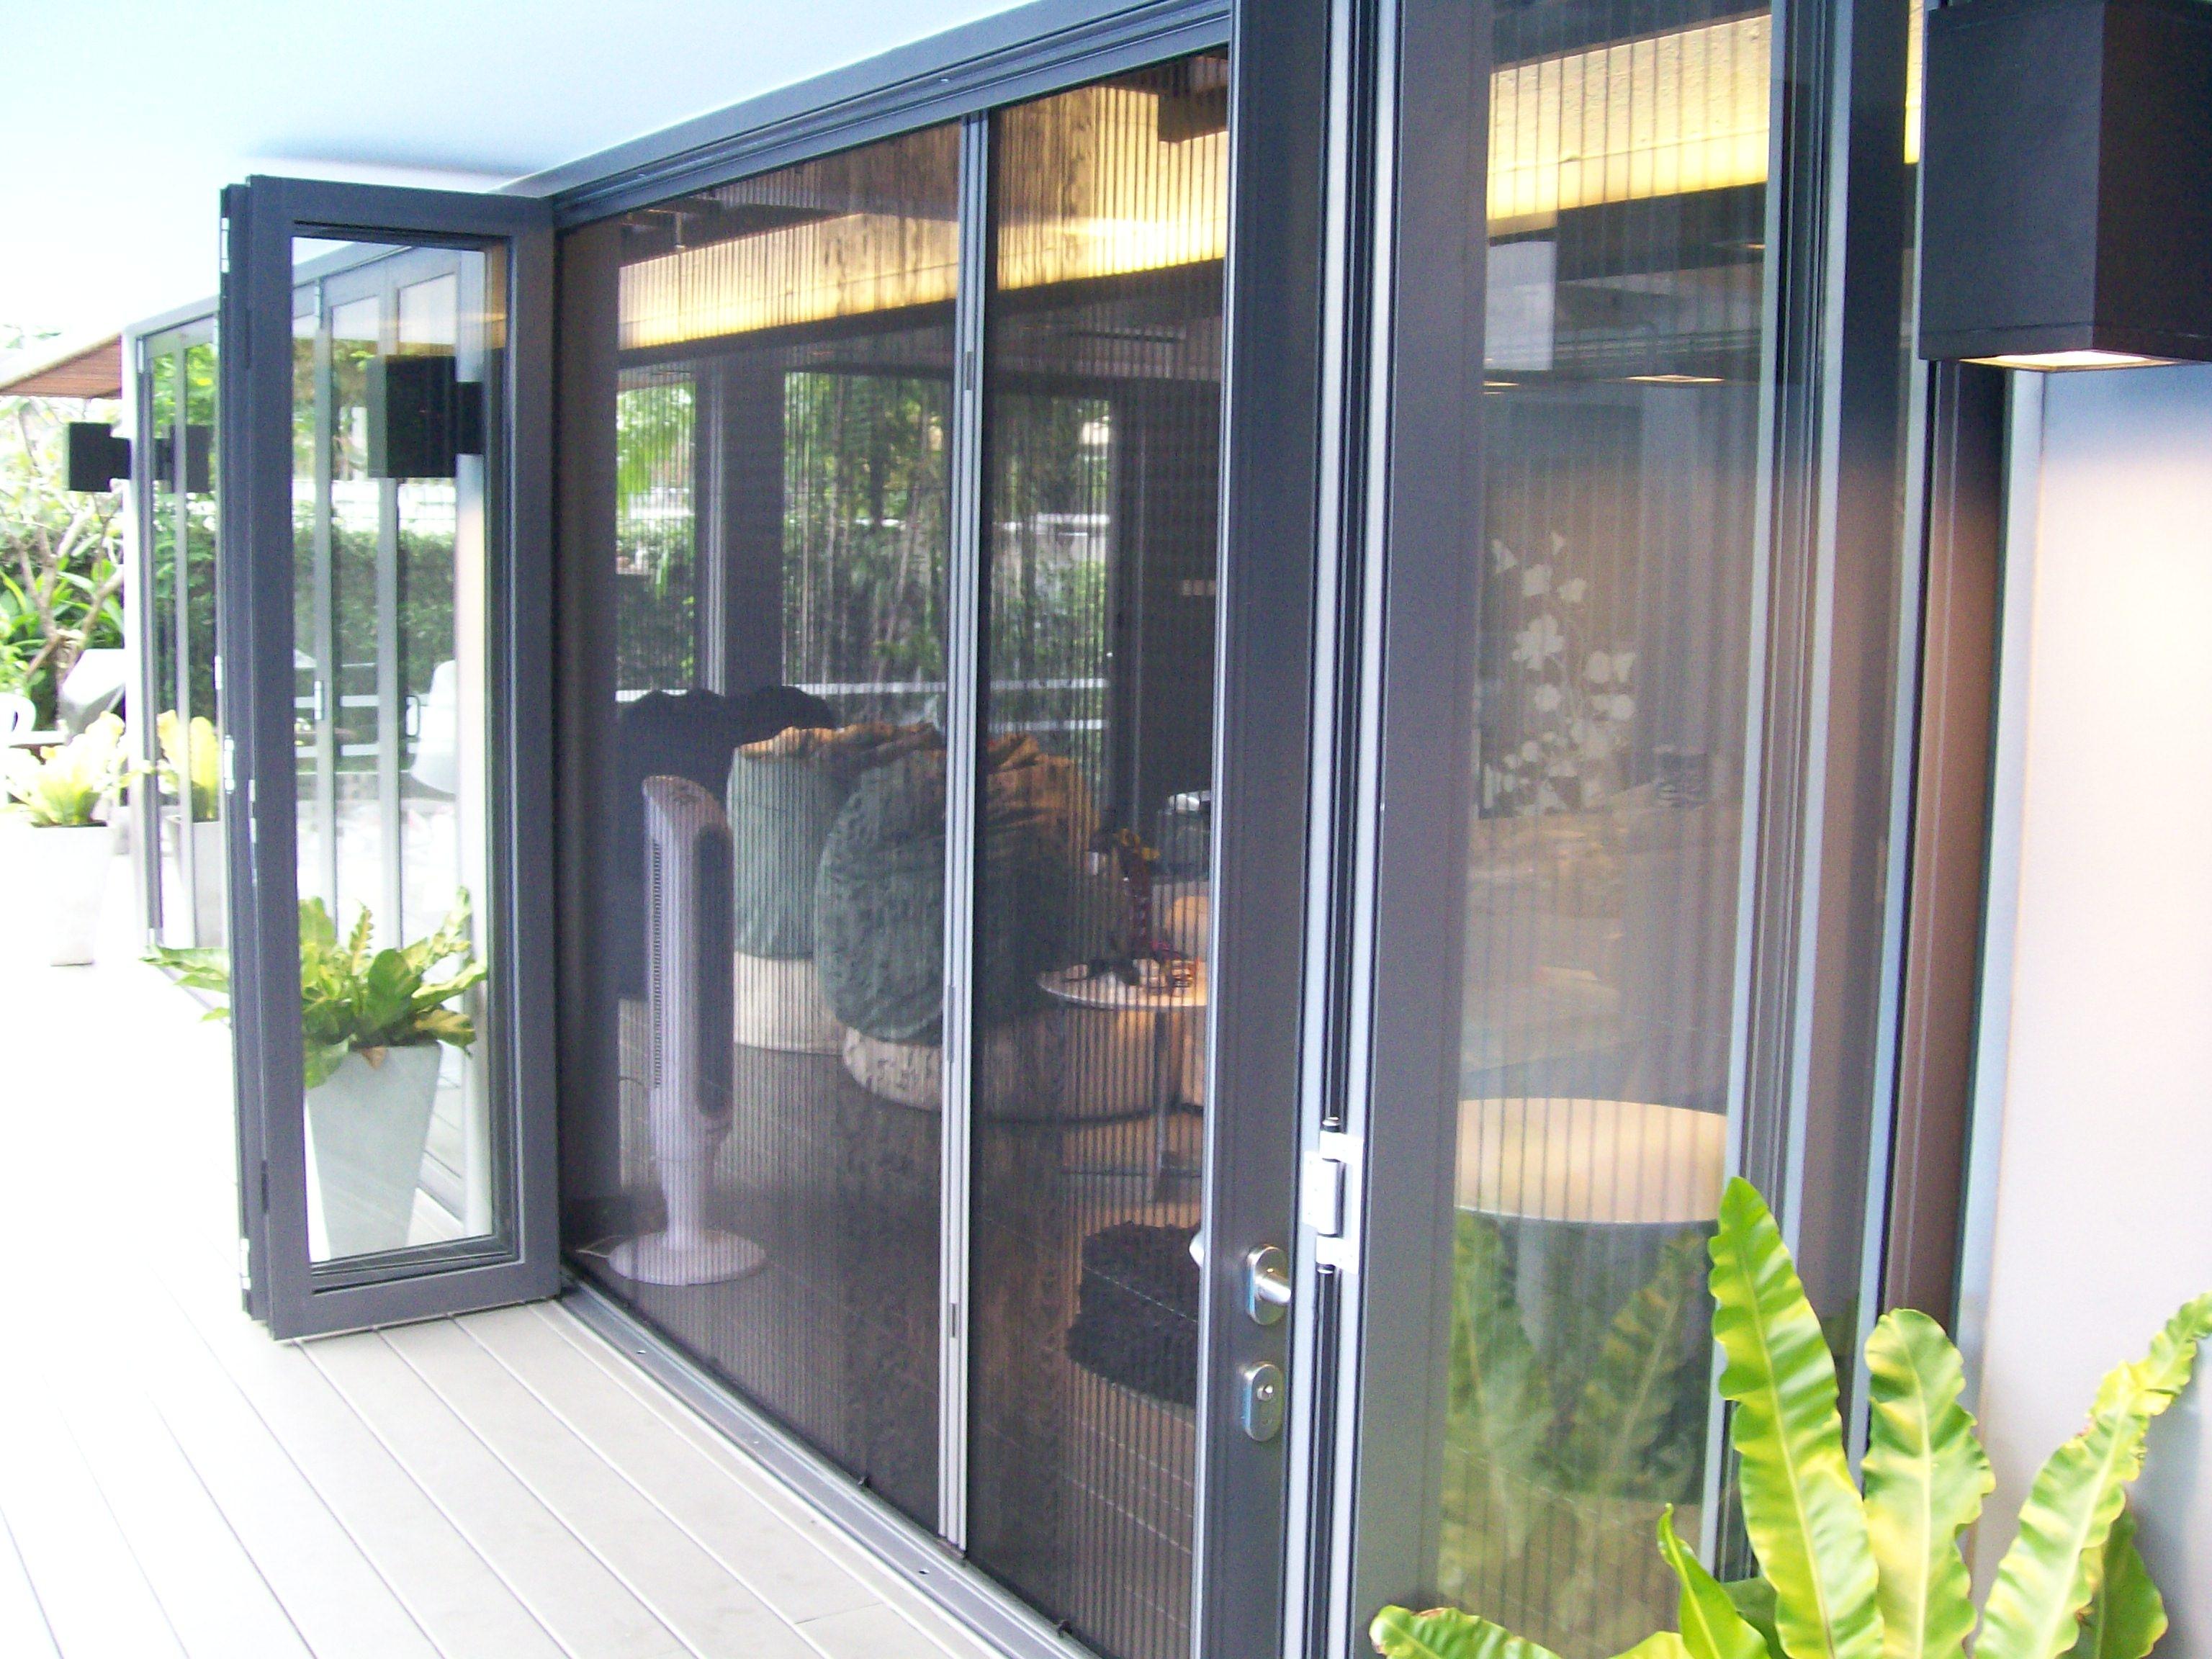 Fly Screens For Sliding Glass DoorsFly Screens For Sliding Glass Doors